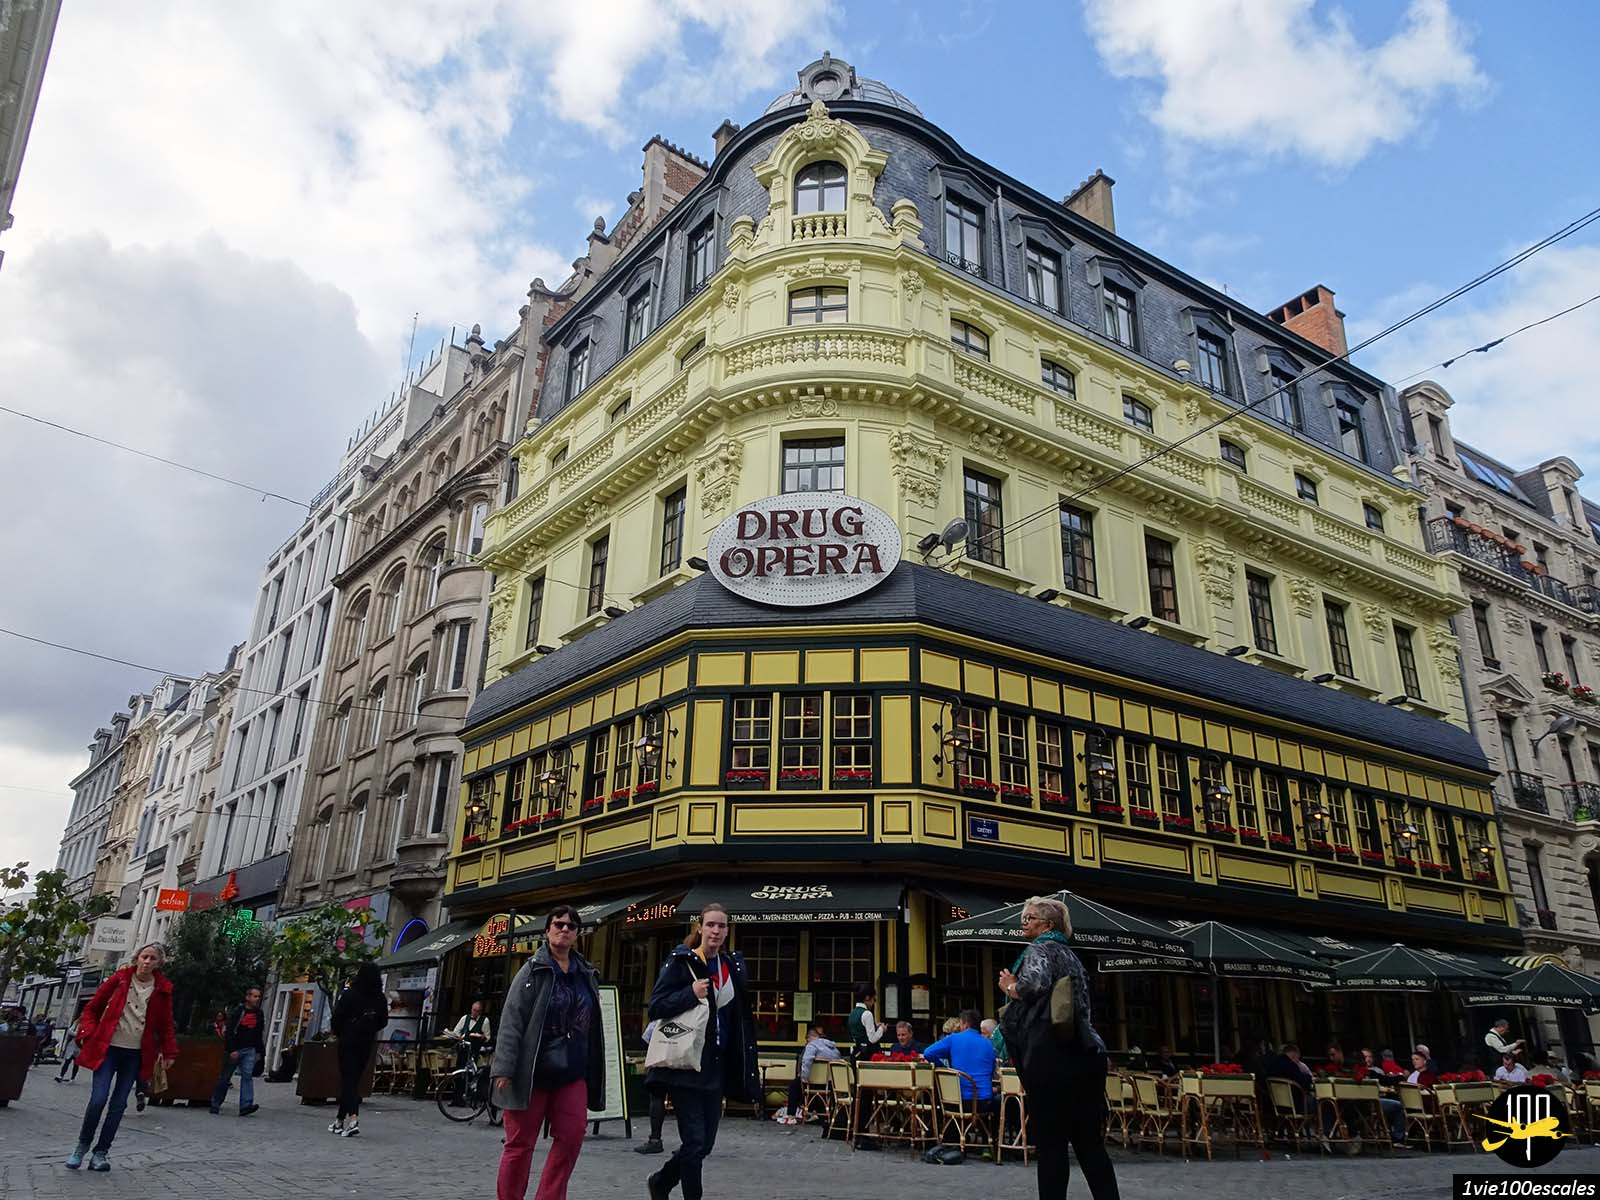 La belle façade du restaurant Drug Opera de Bruxelles